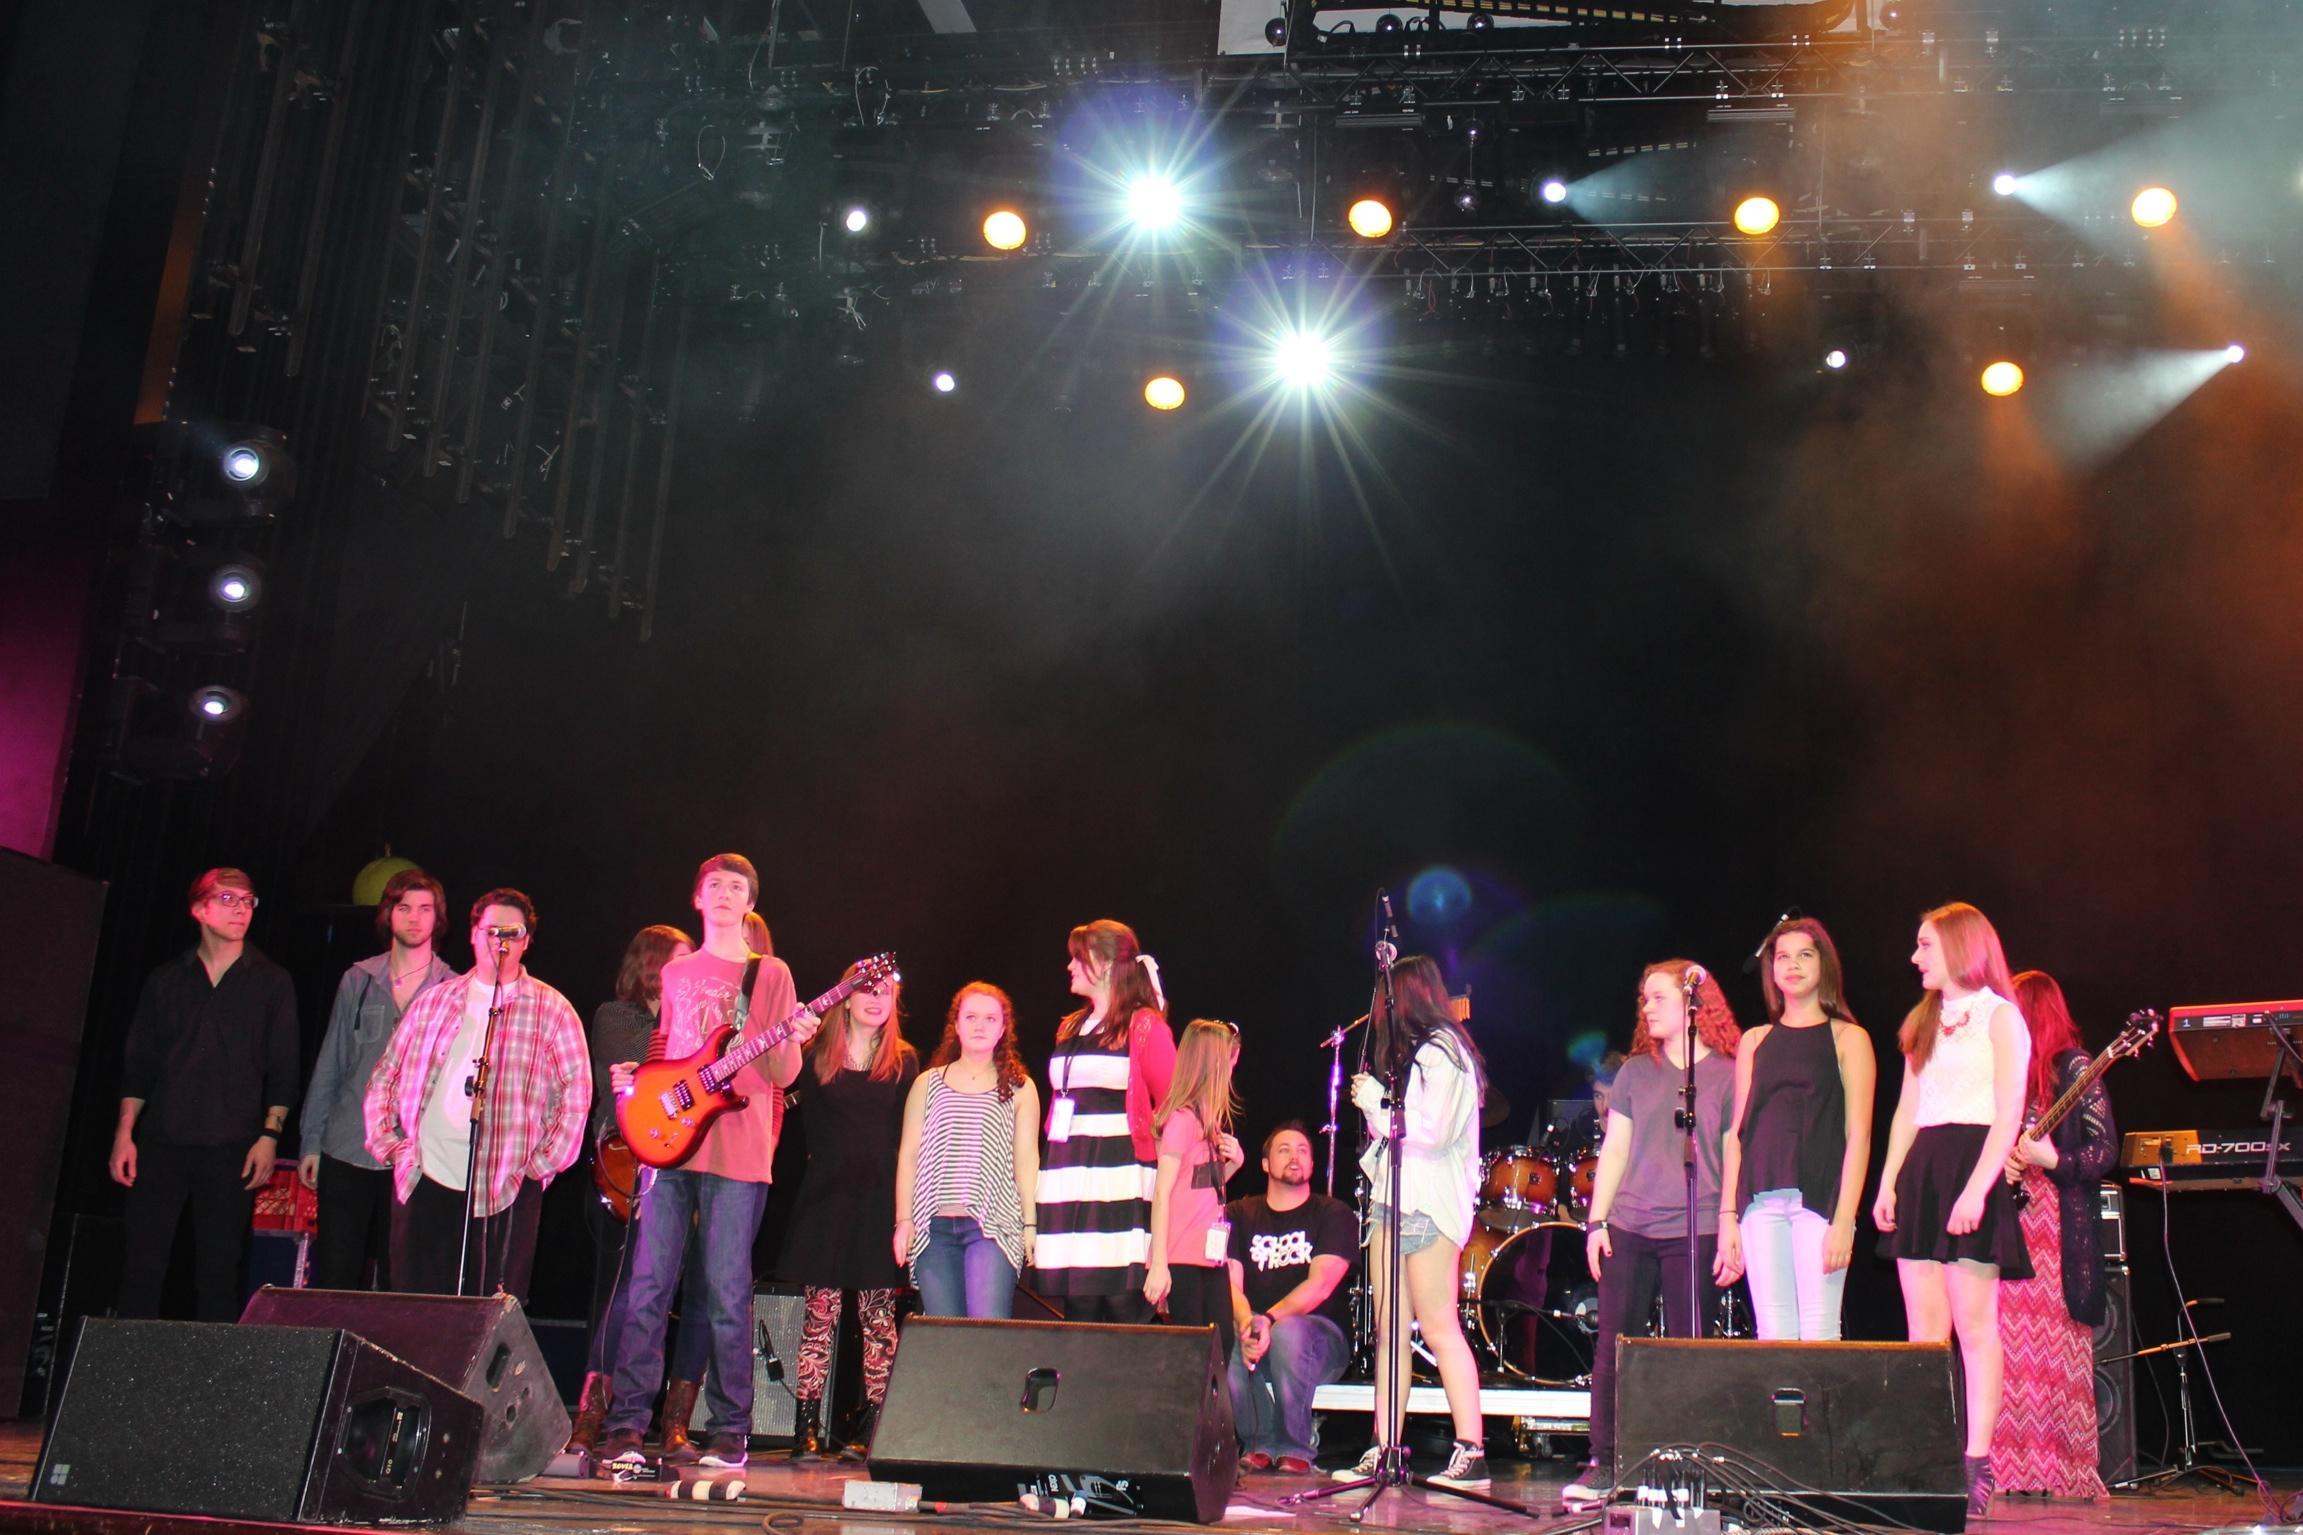 School of Rock Nashville image 6